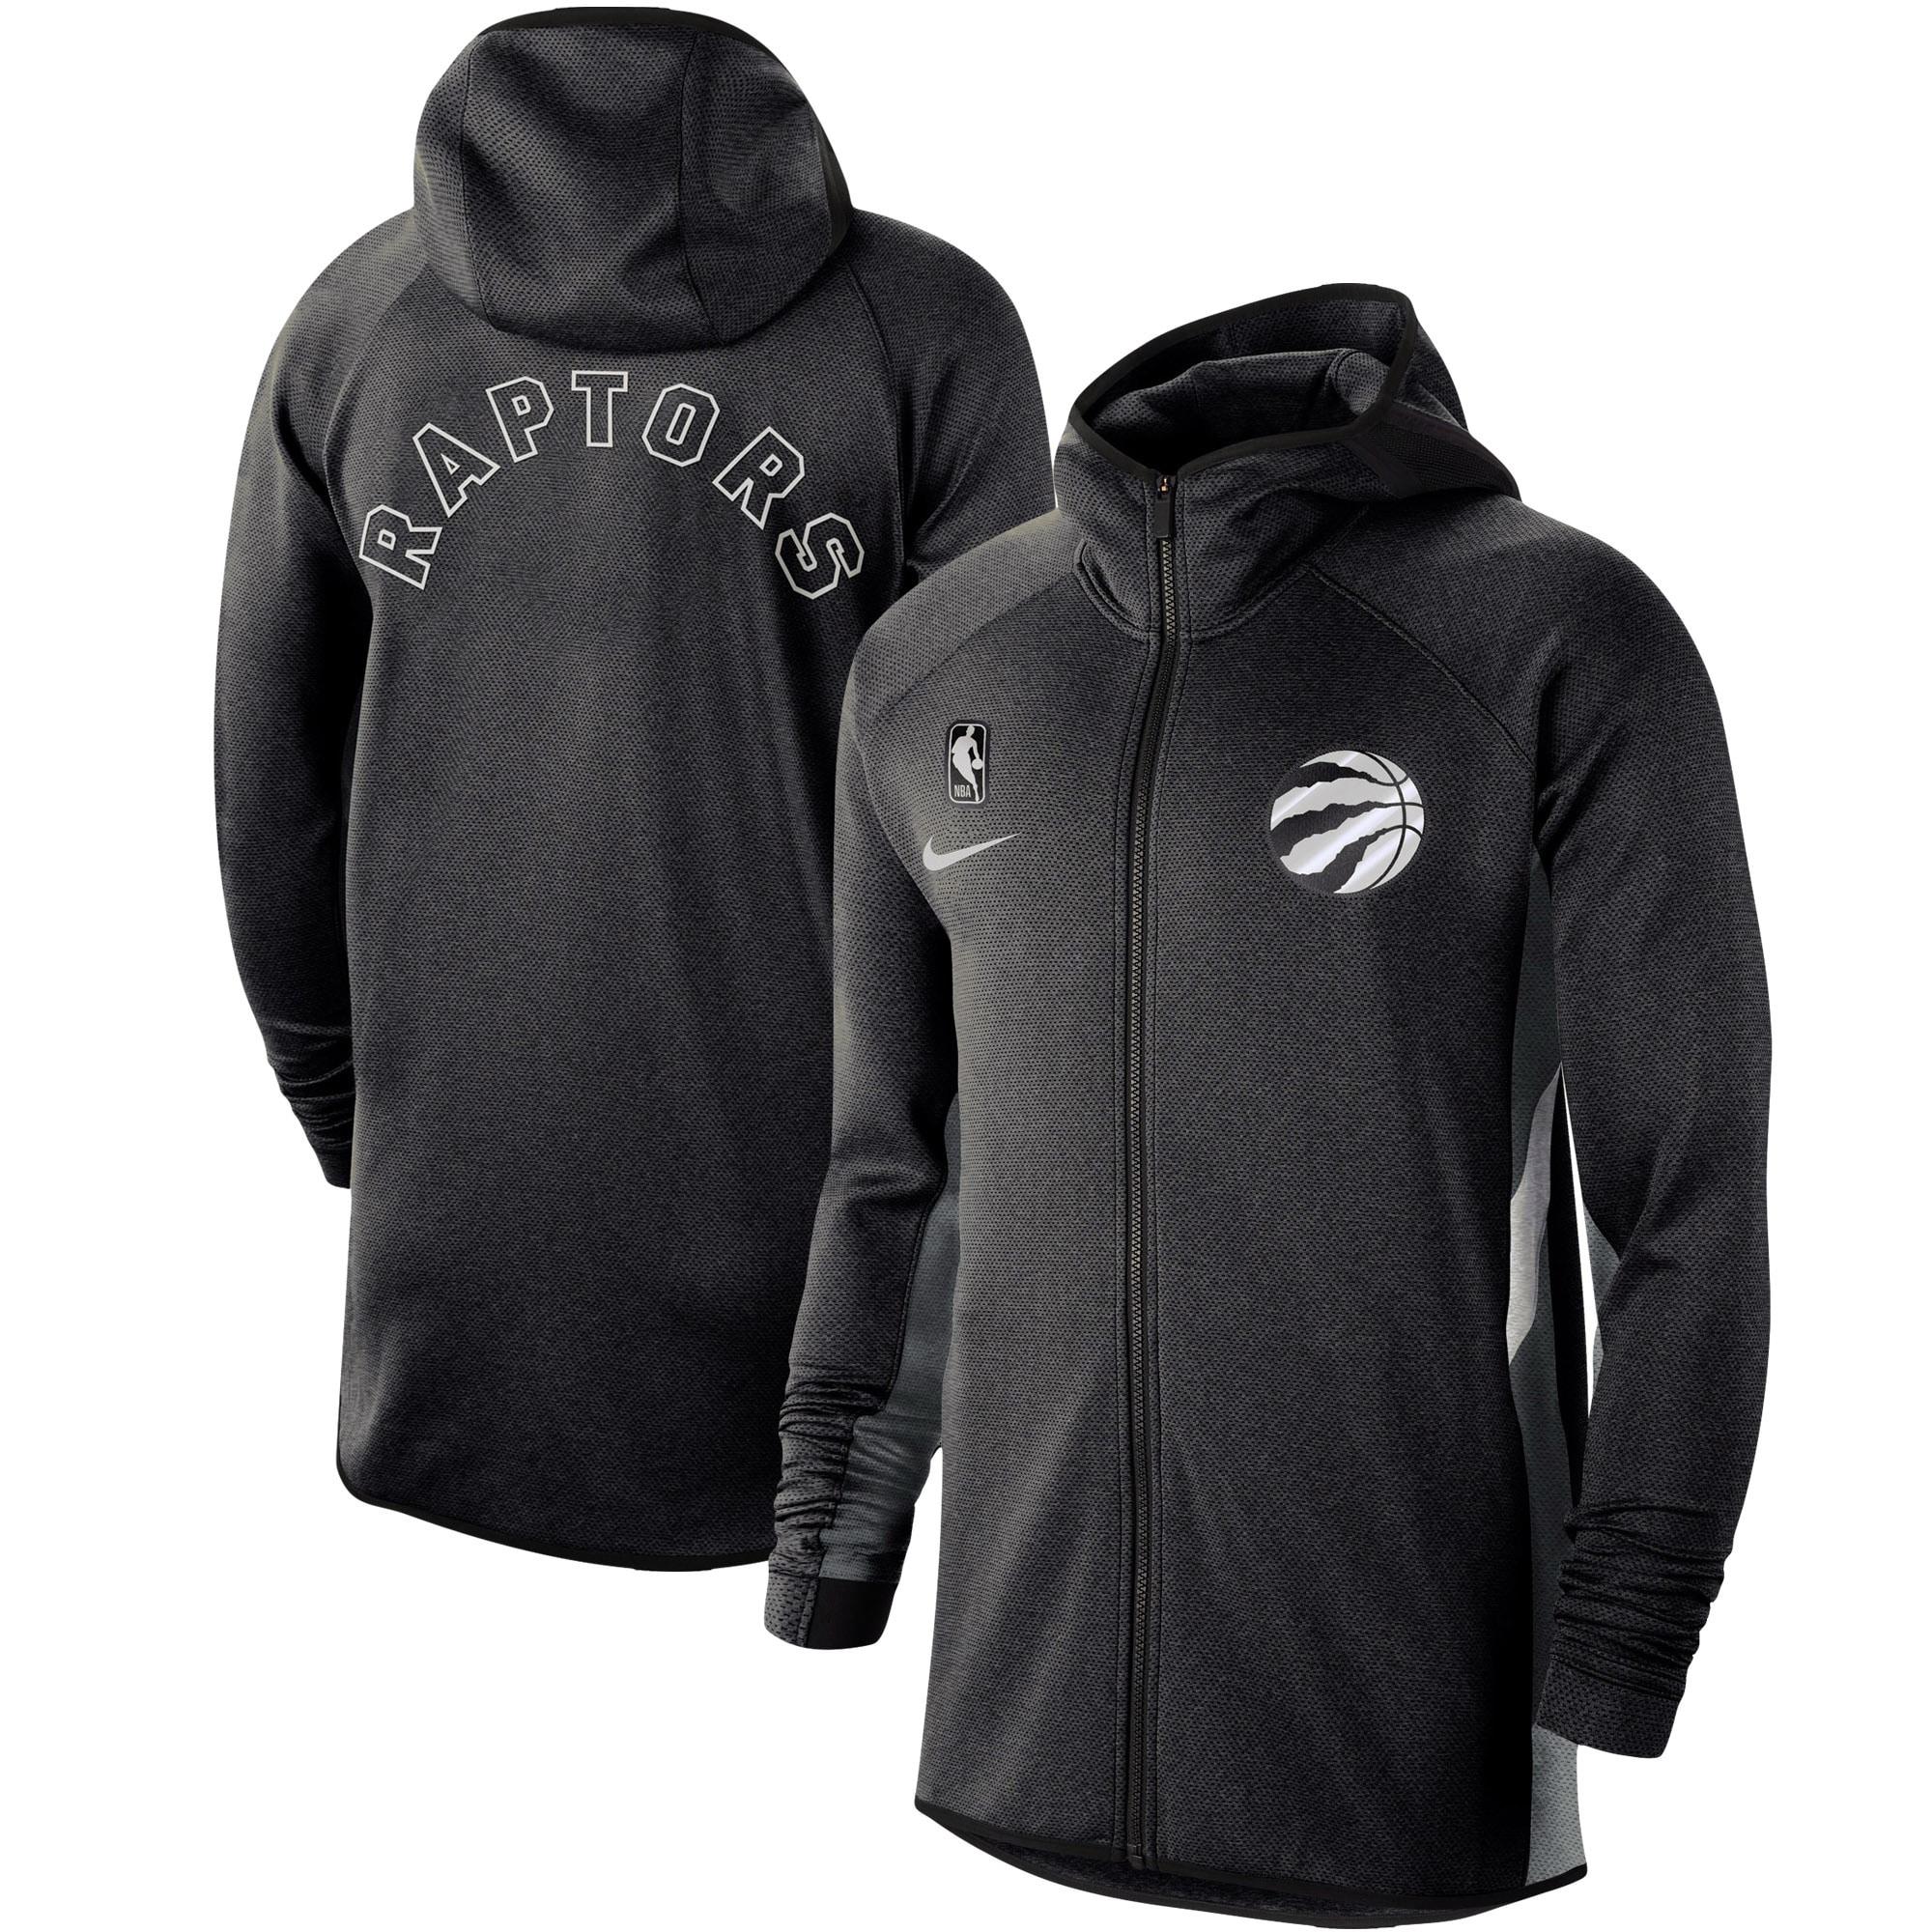 Toronto Raptors Nike Authentic Showtime Therma Flex Performance Full-Zip Hoodie - Heathered Black